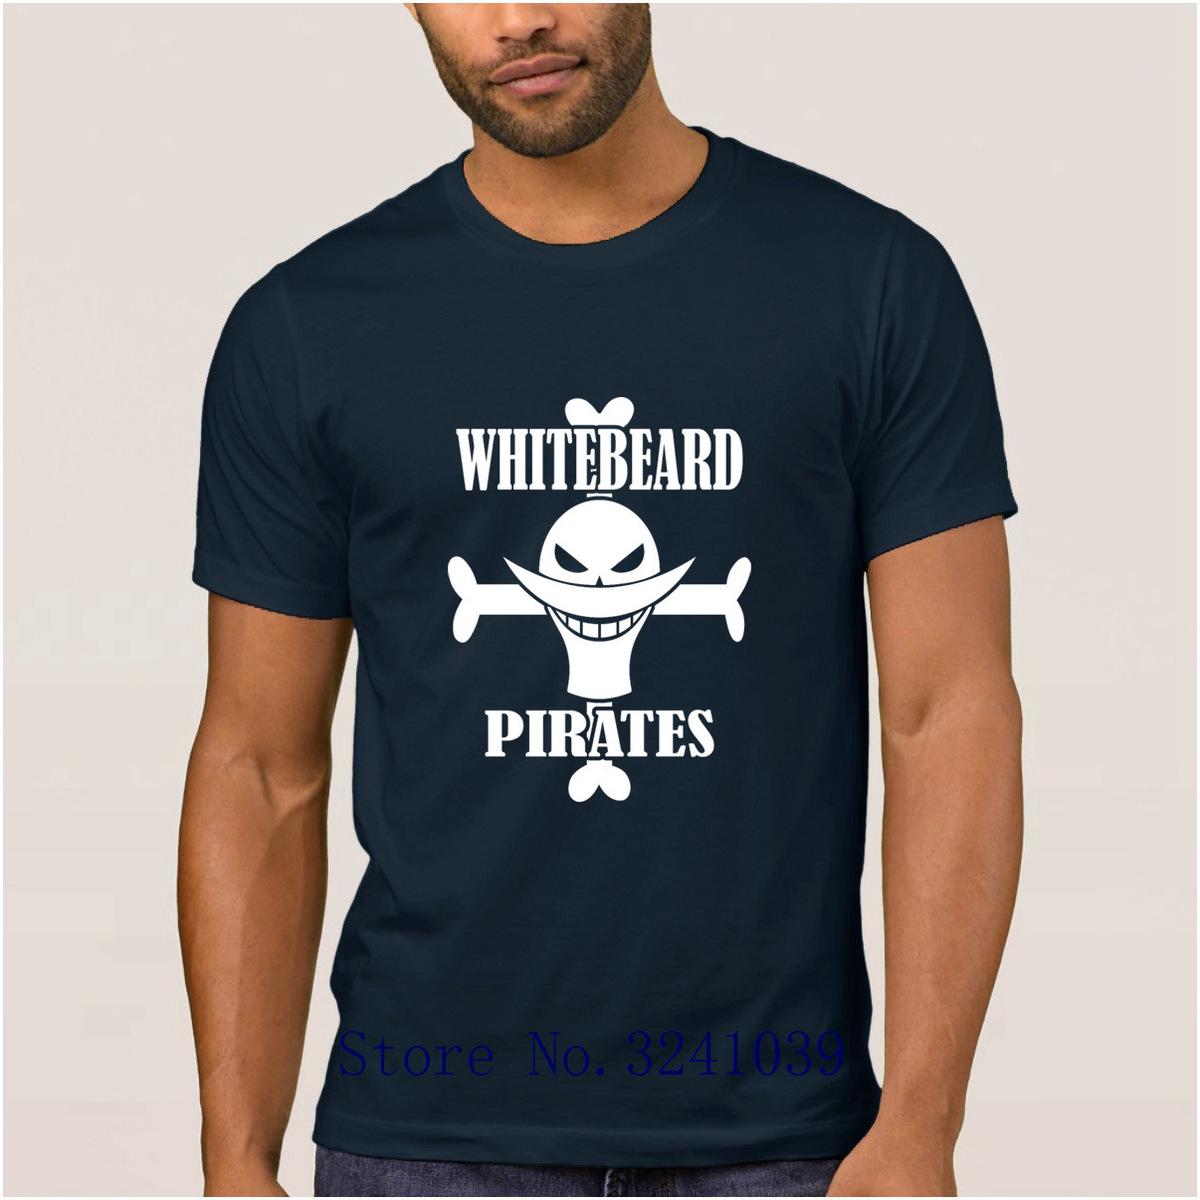 La Maxpa Custom Great whitebeard pirates mens t shirt 2017 Graphic One Piece Janpanese Anime t-shirt for men Leisure tshirt